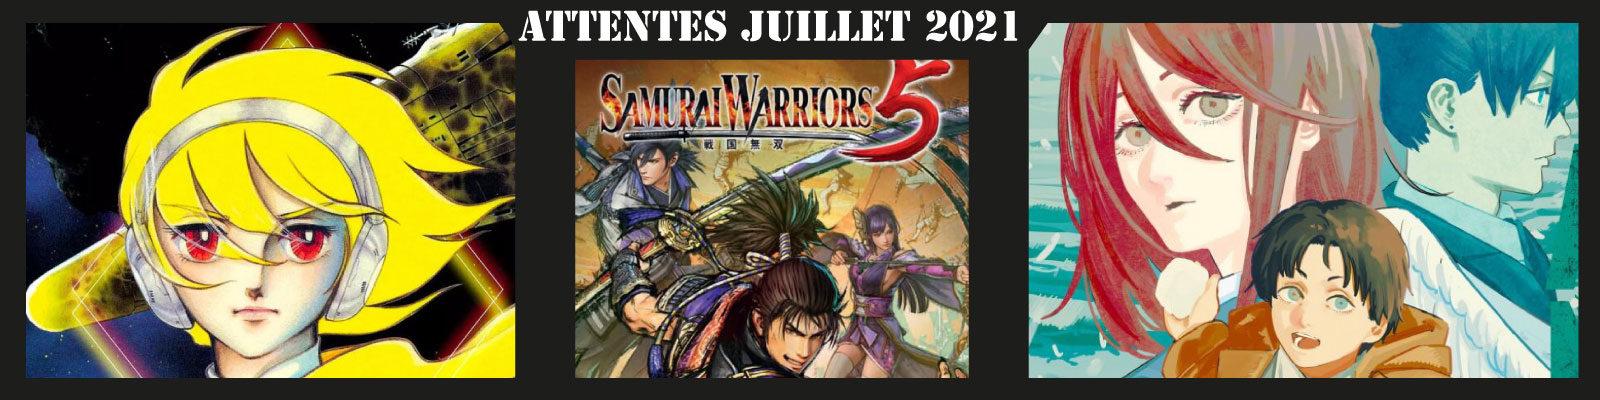 ATTENTES-JUILLET 2021